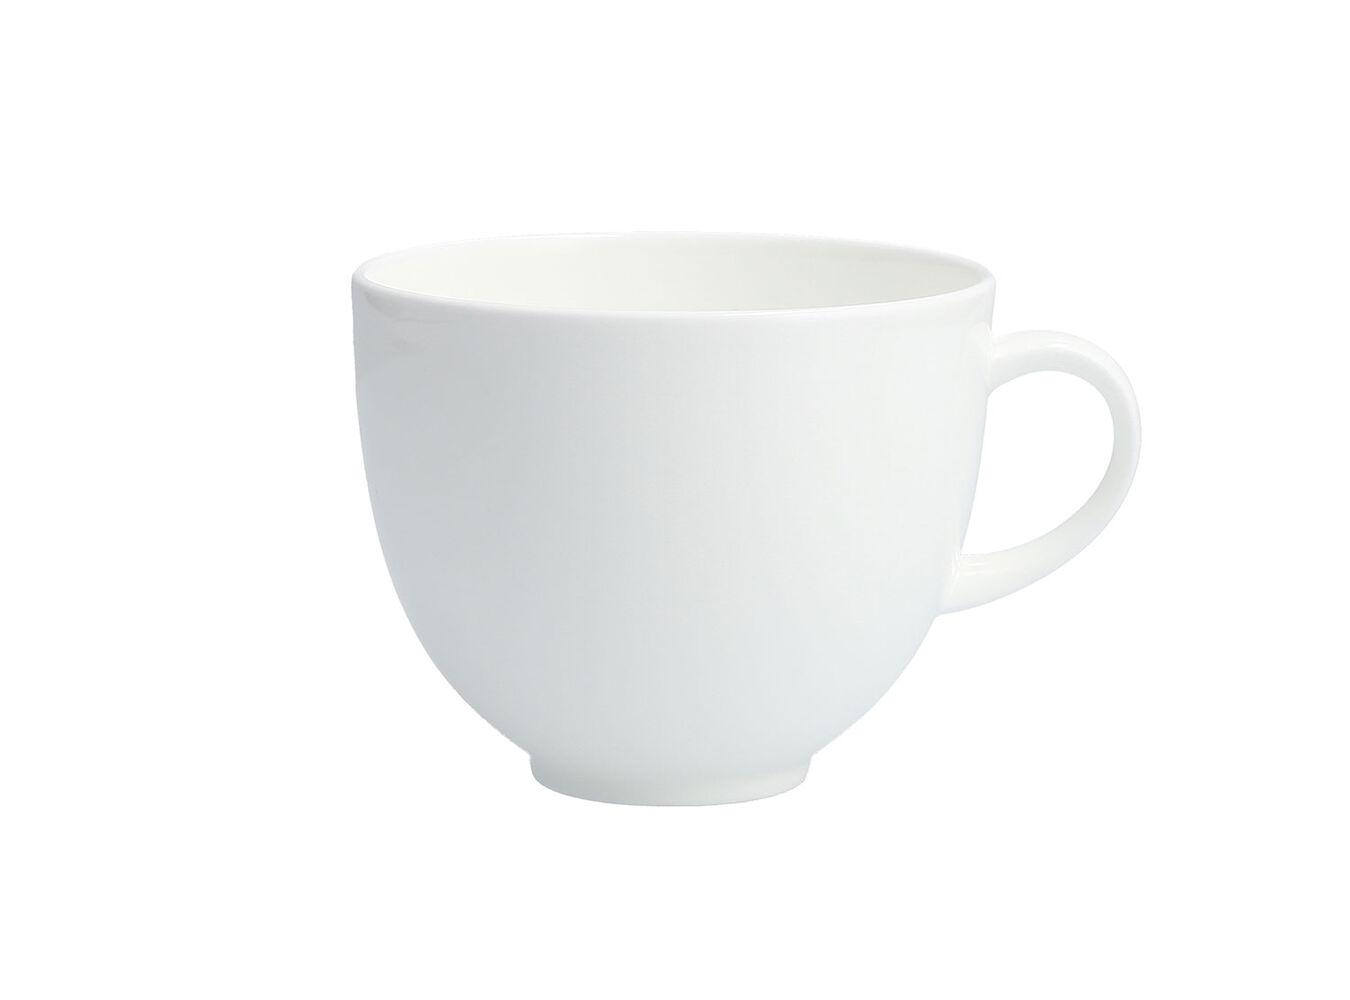 Fortessa Andromeda Bone China Coffee Cups, Set of 4 | Sur La Table